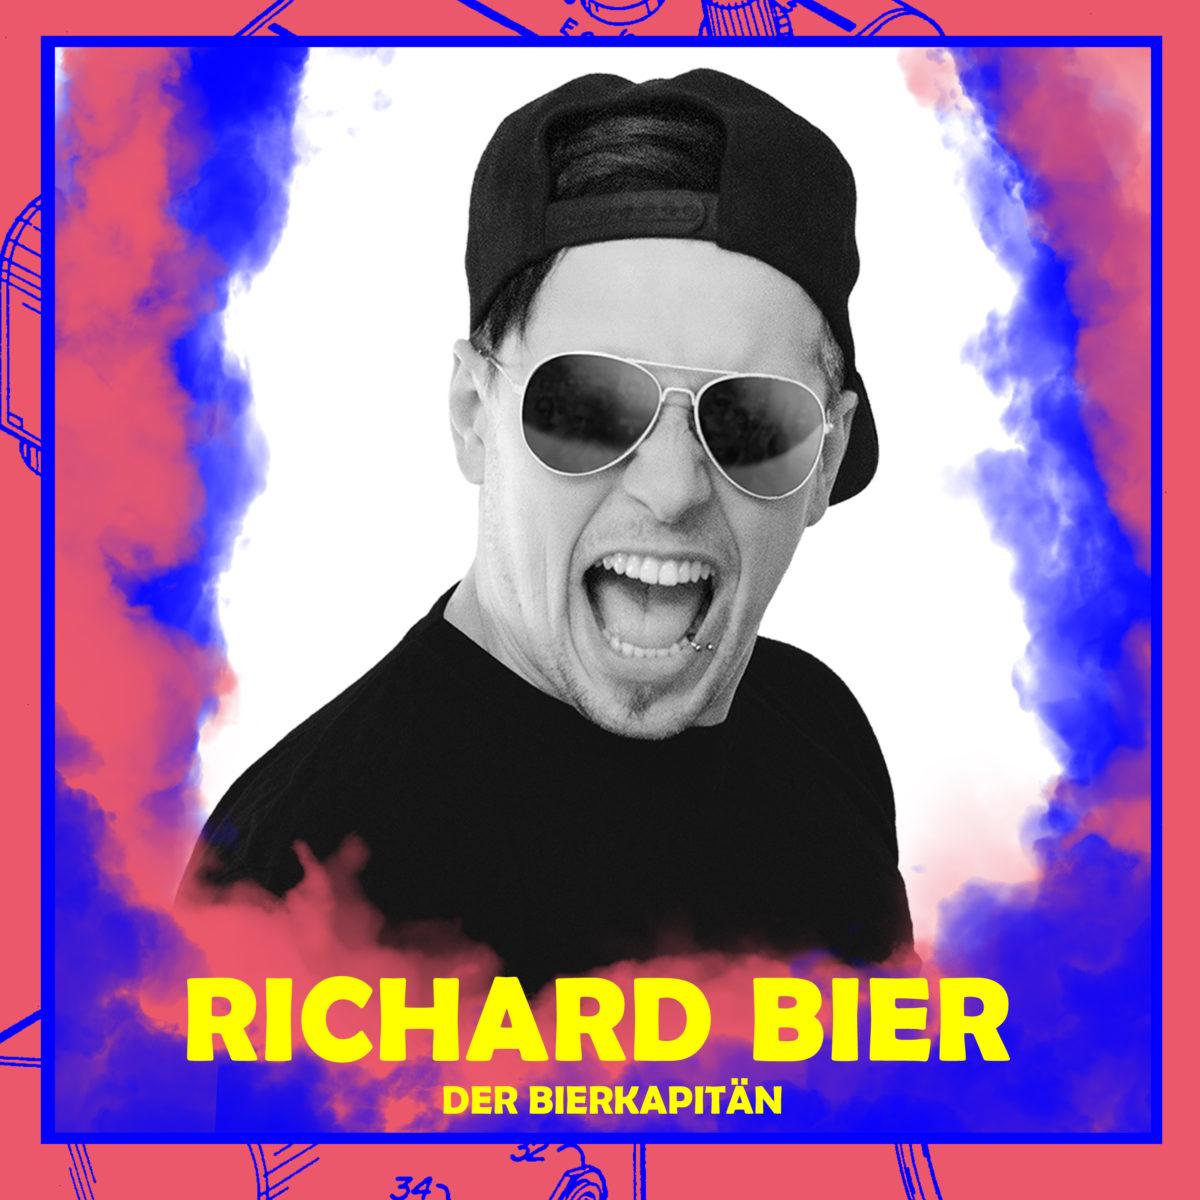 Richard Bier (Der Bierkapitän)